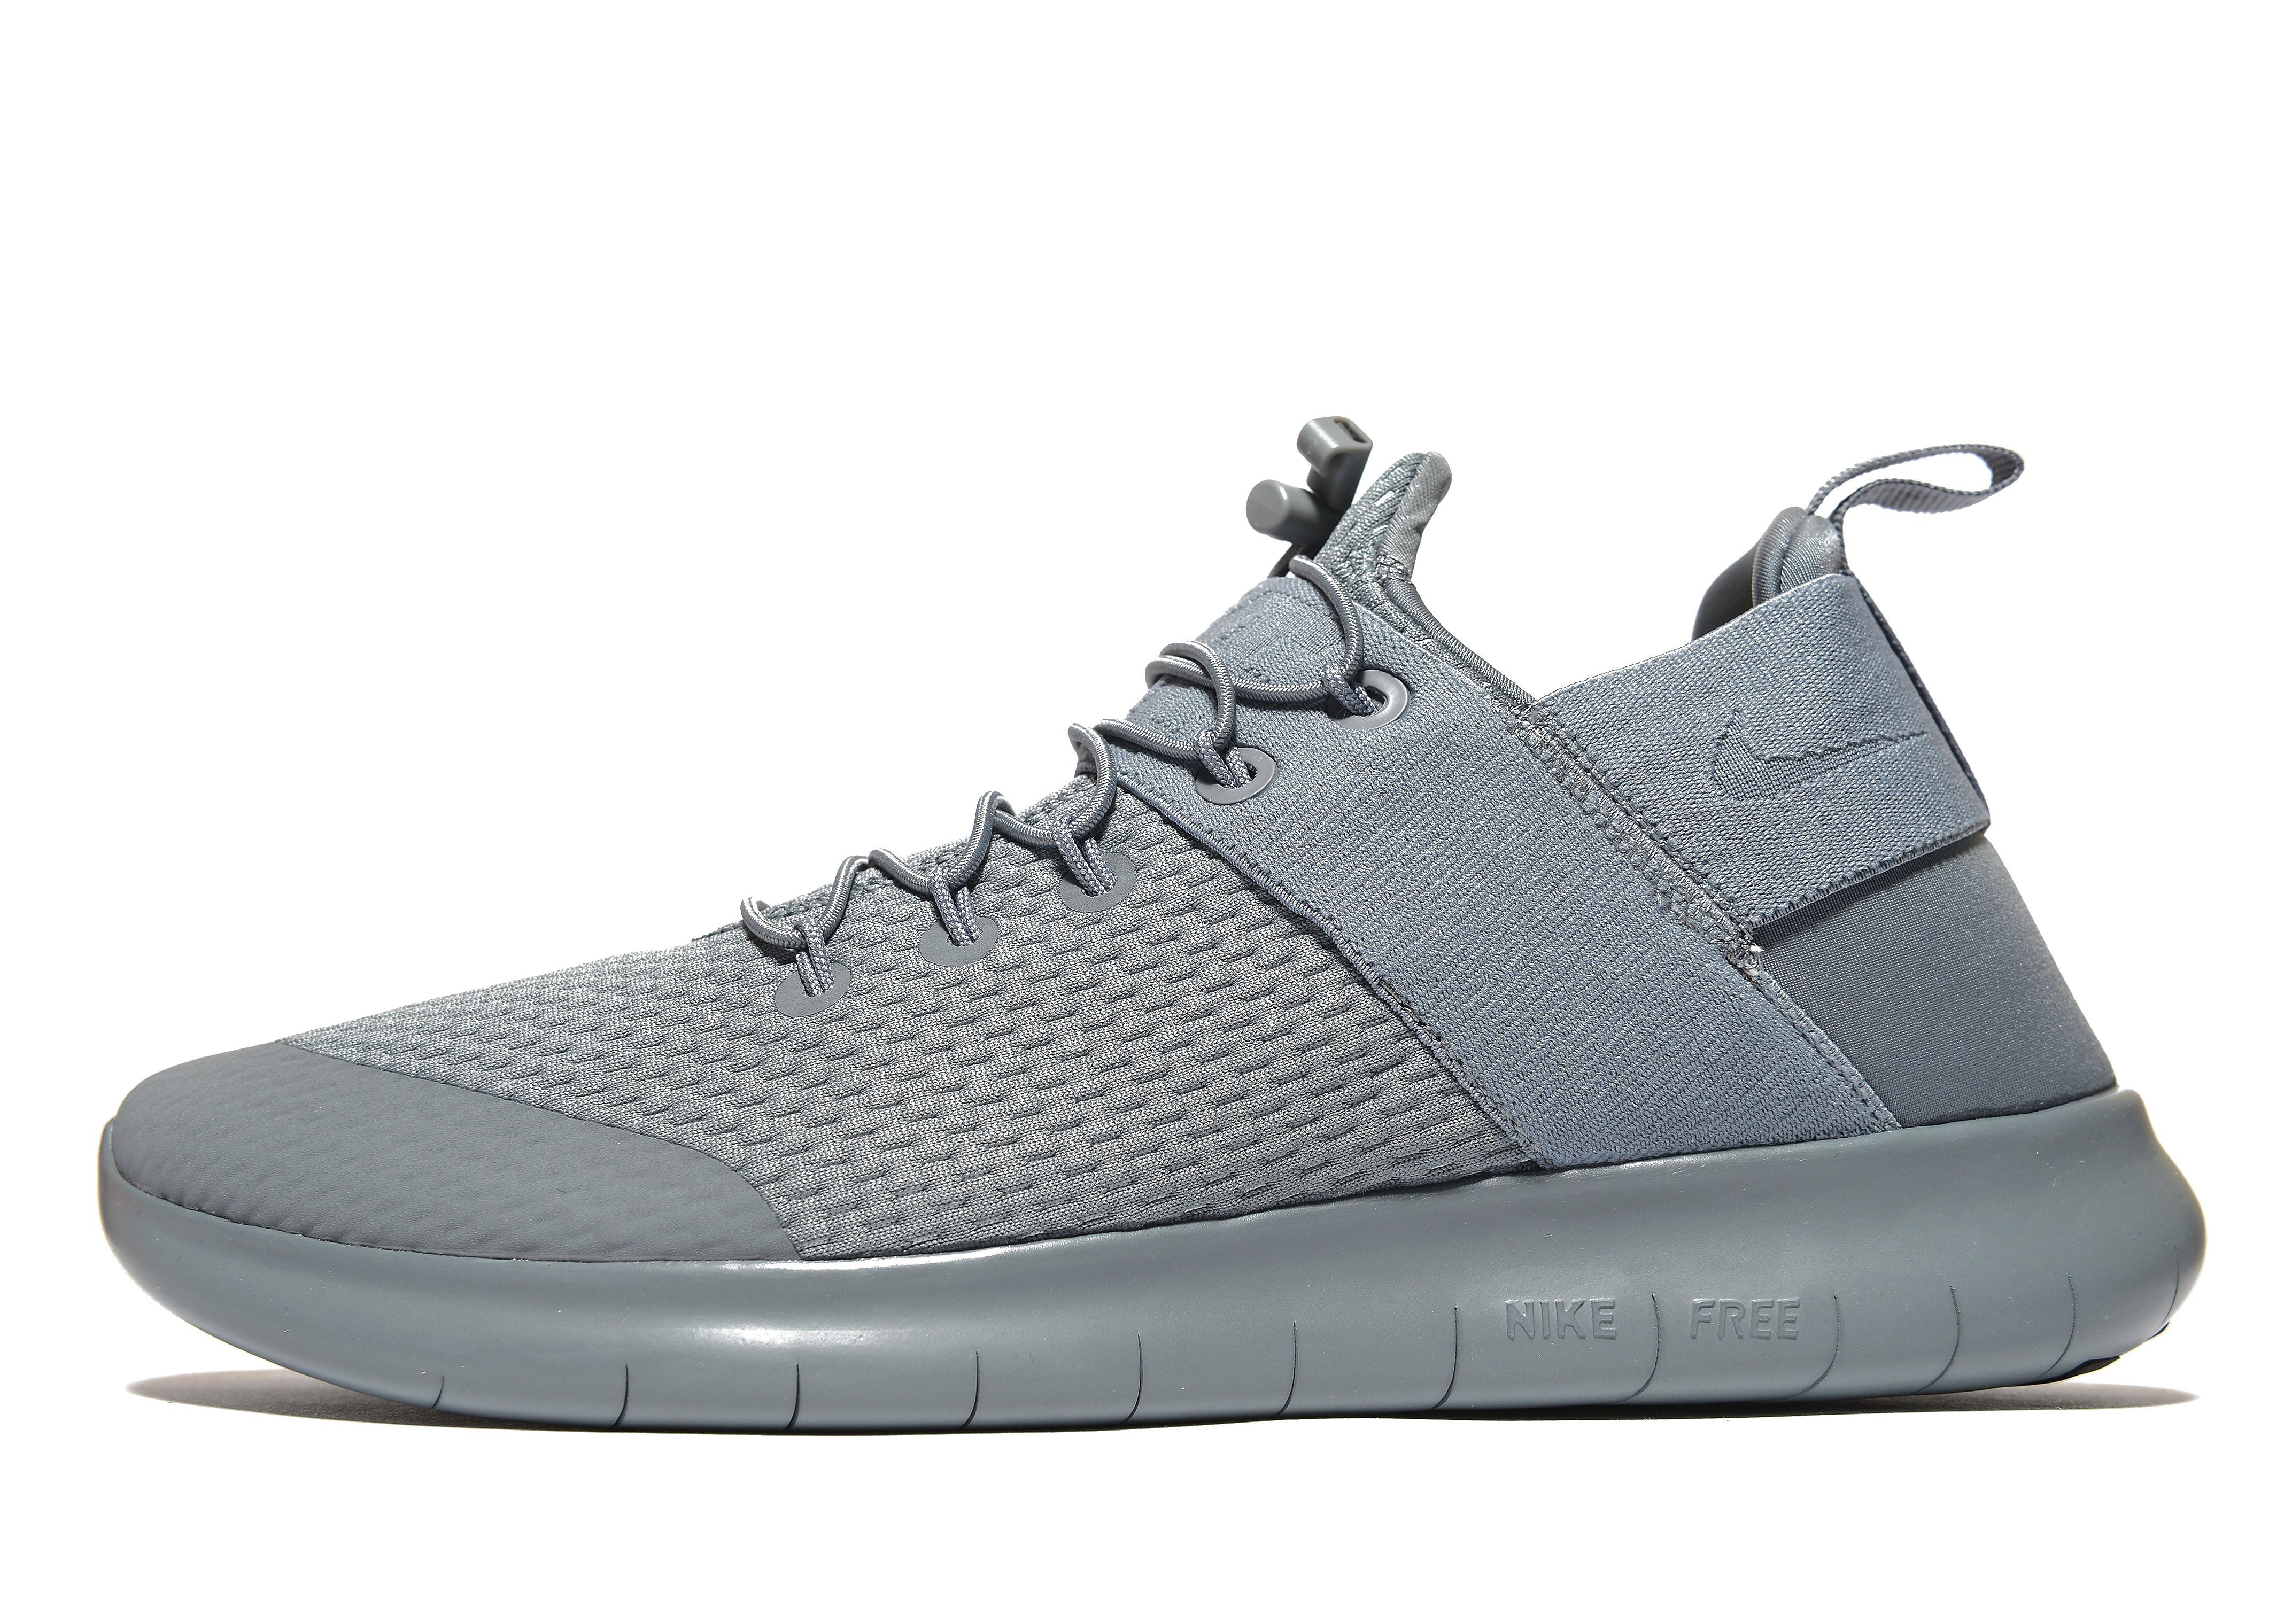 Nike Free Run Commuter 2